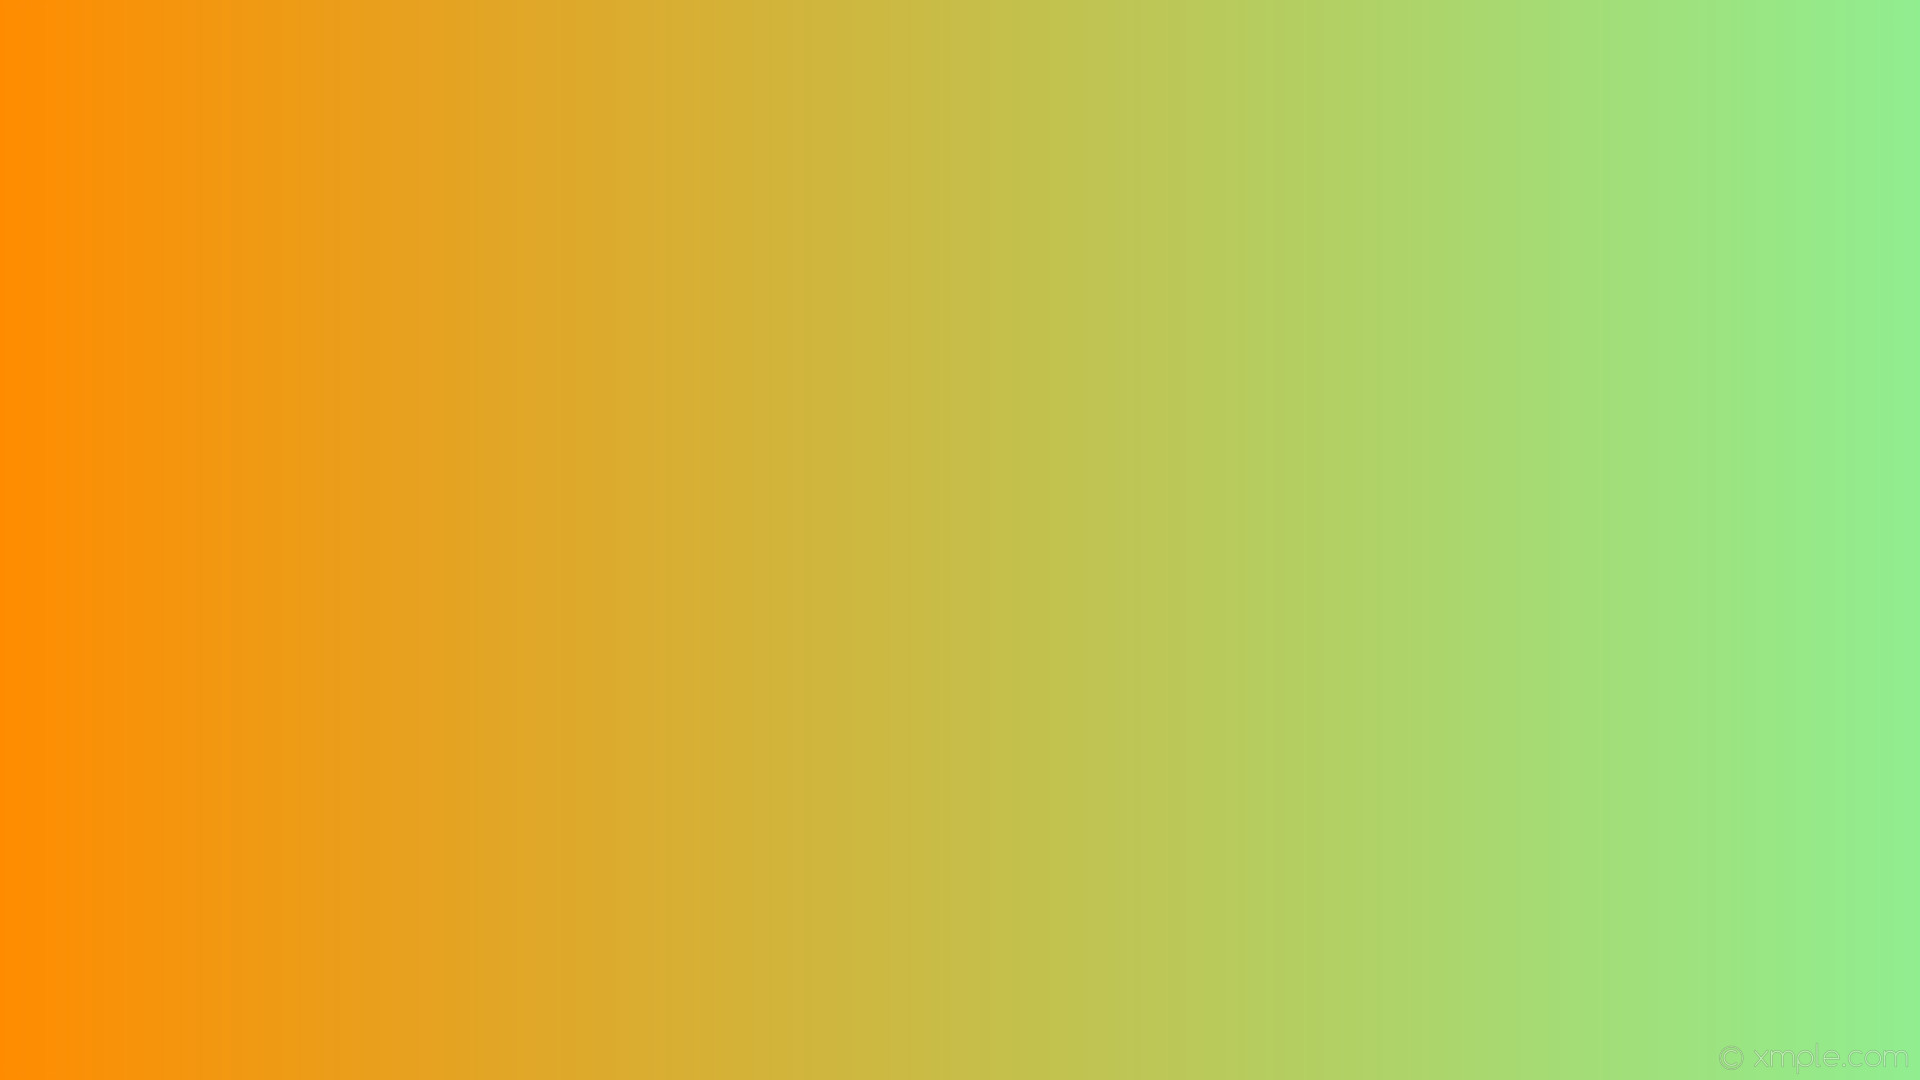 wallpaper linear green orange gradient light green dark orange #90ee90  #ff8c00 0°